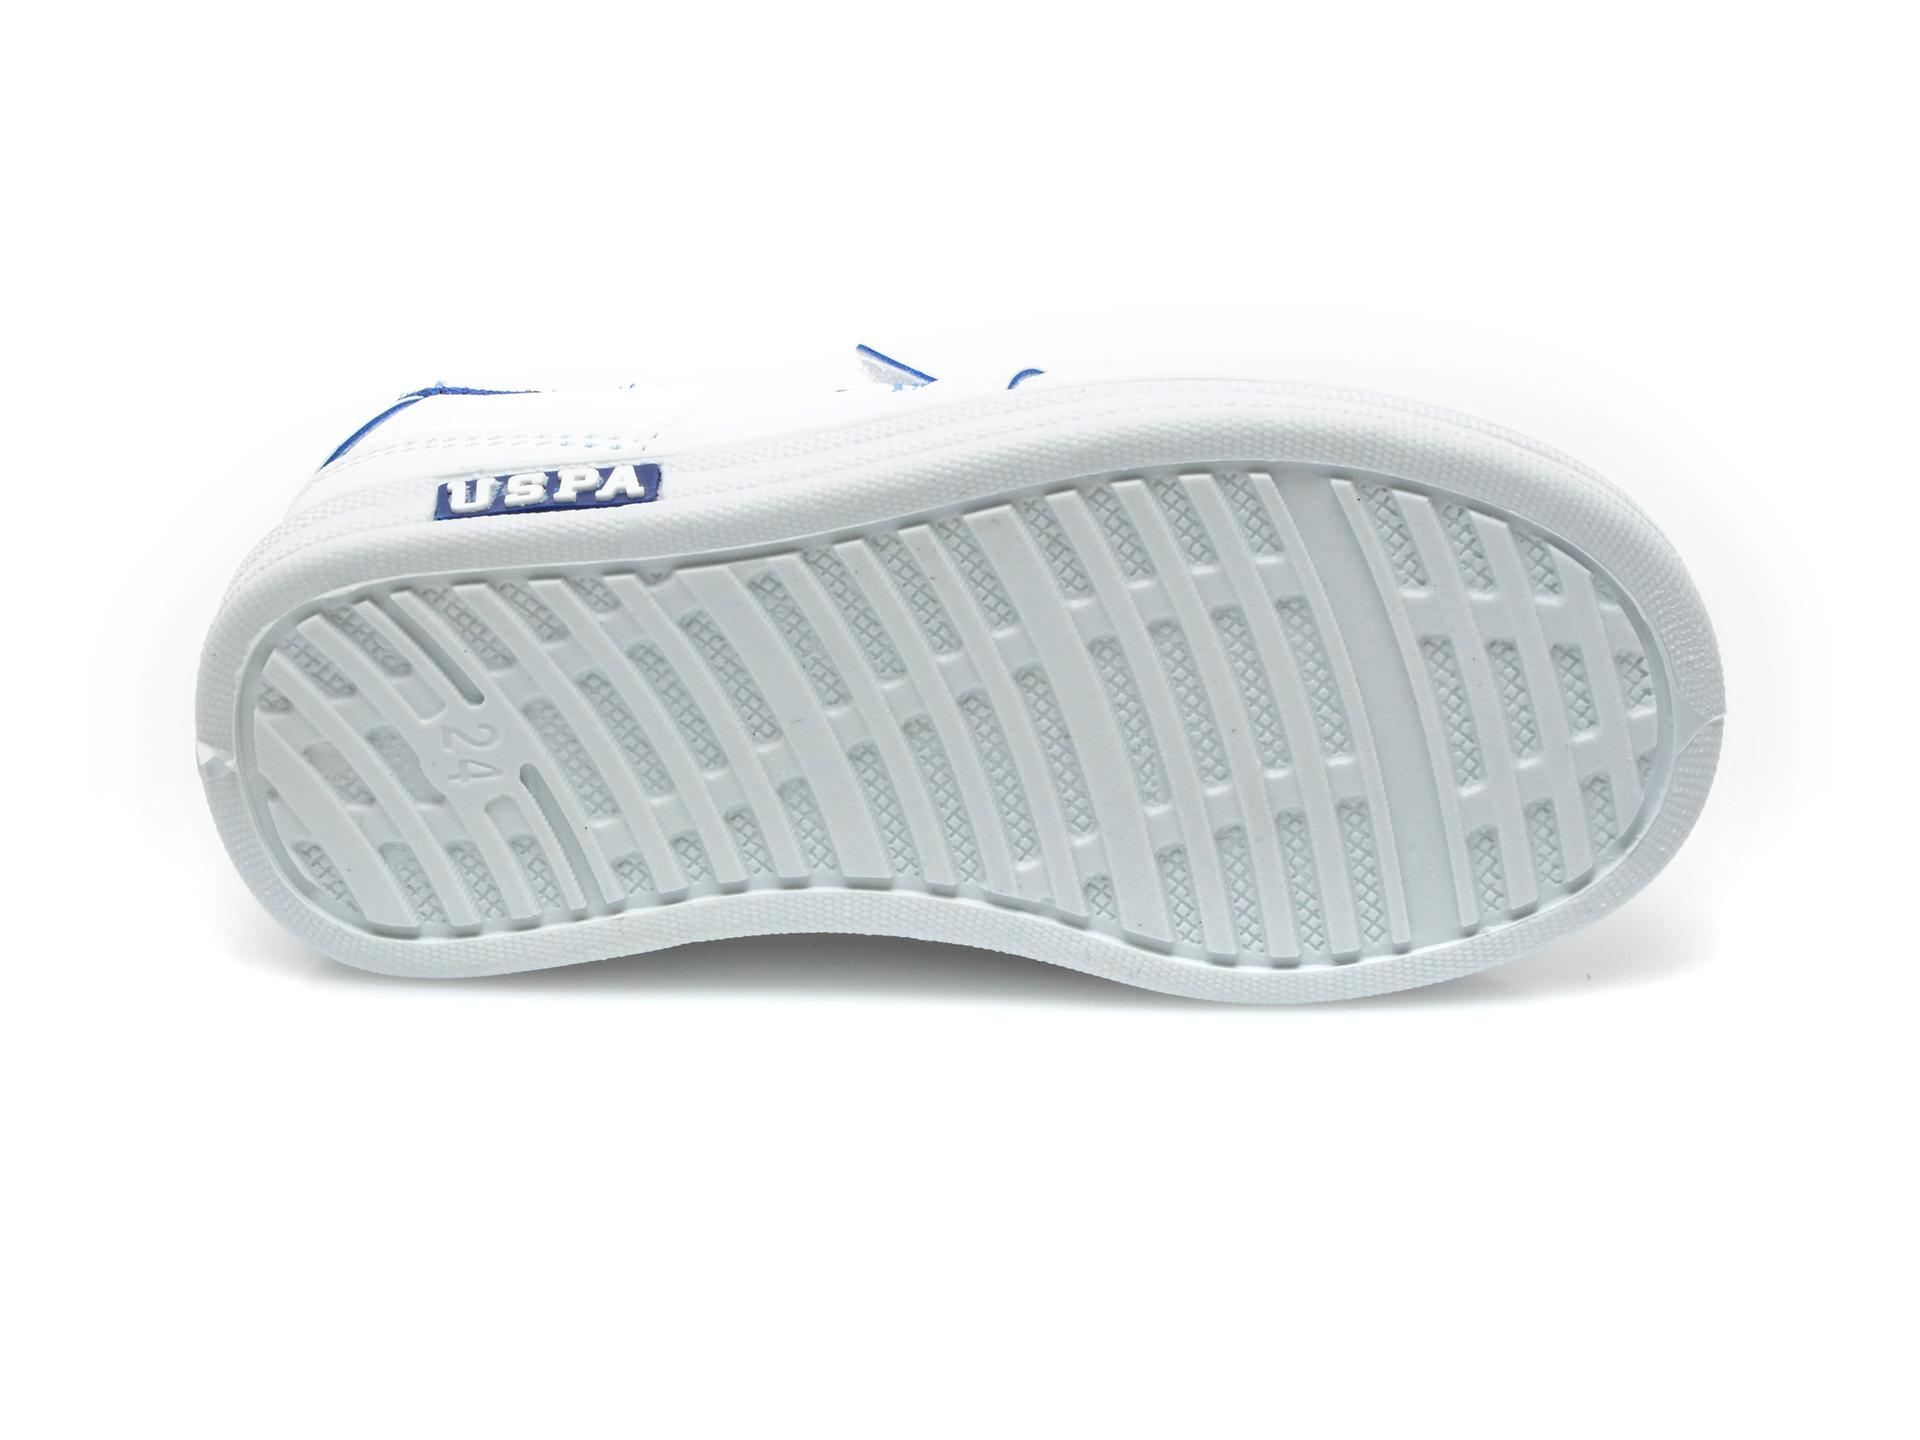 Pantofi sport US POLO ASSN albi, CAME1FX, din piele ecologica - 7